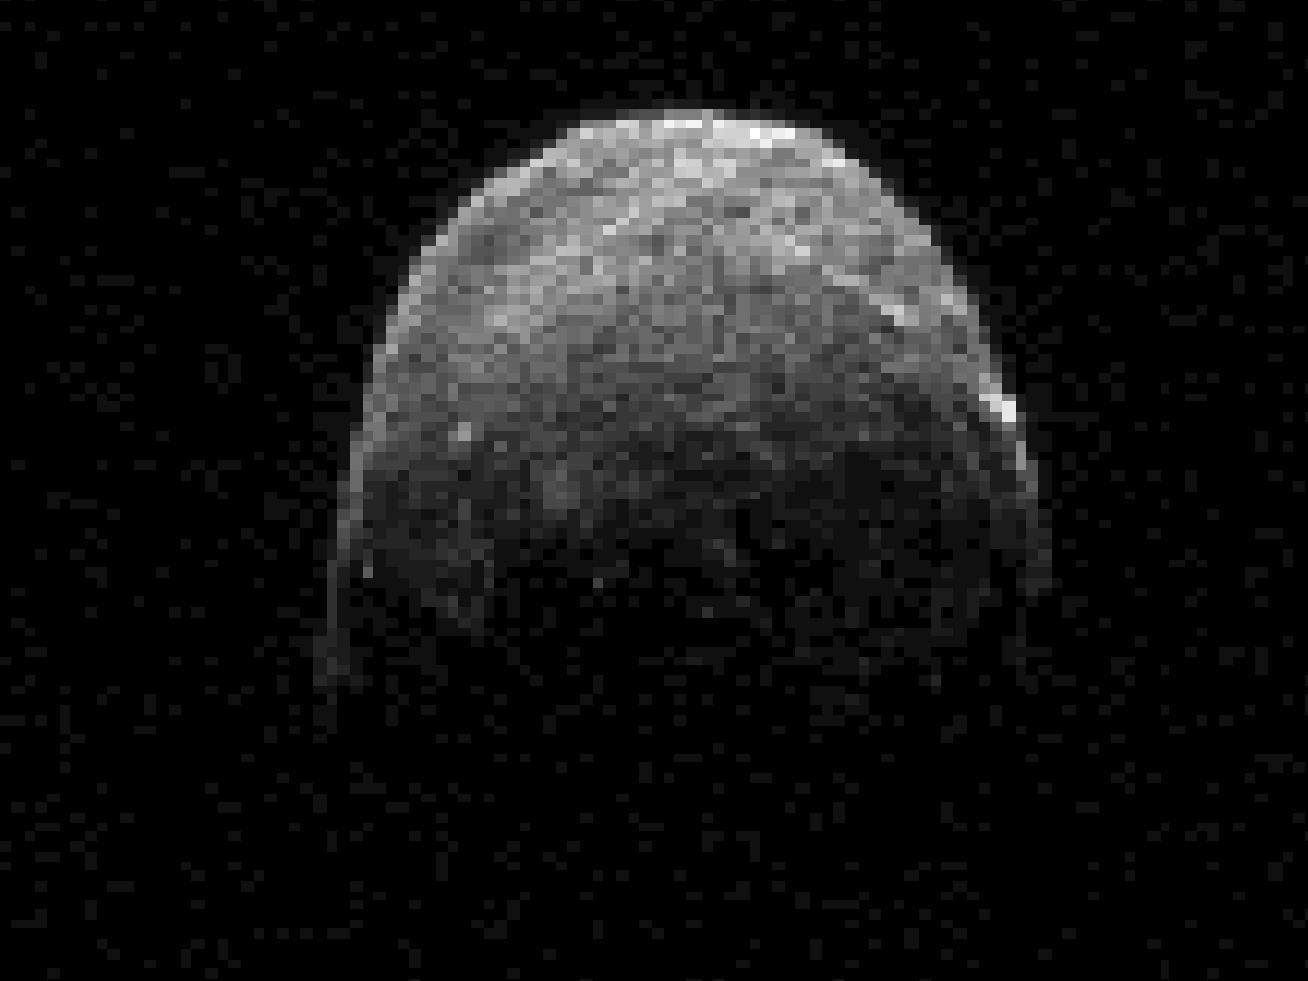 blow huge asteroids come close - photo #40